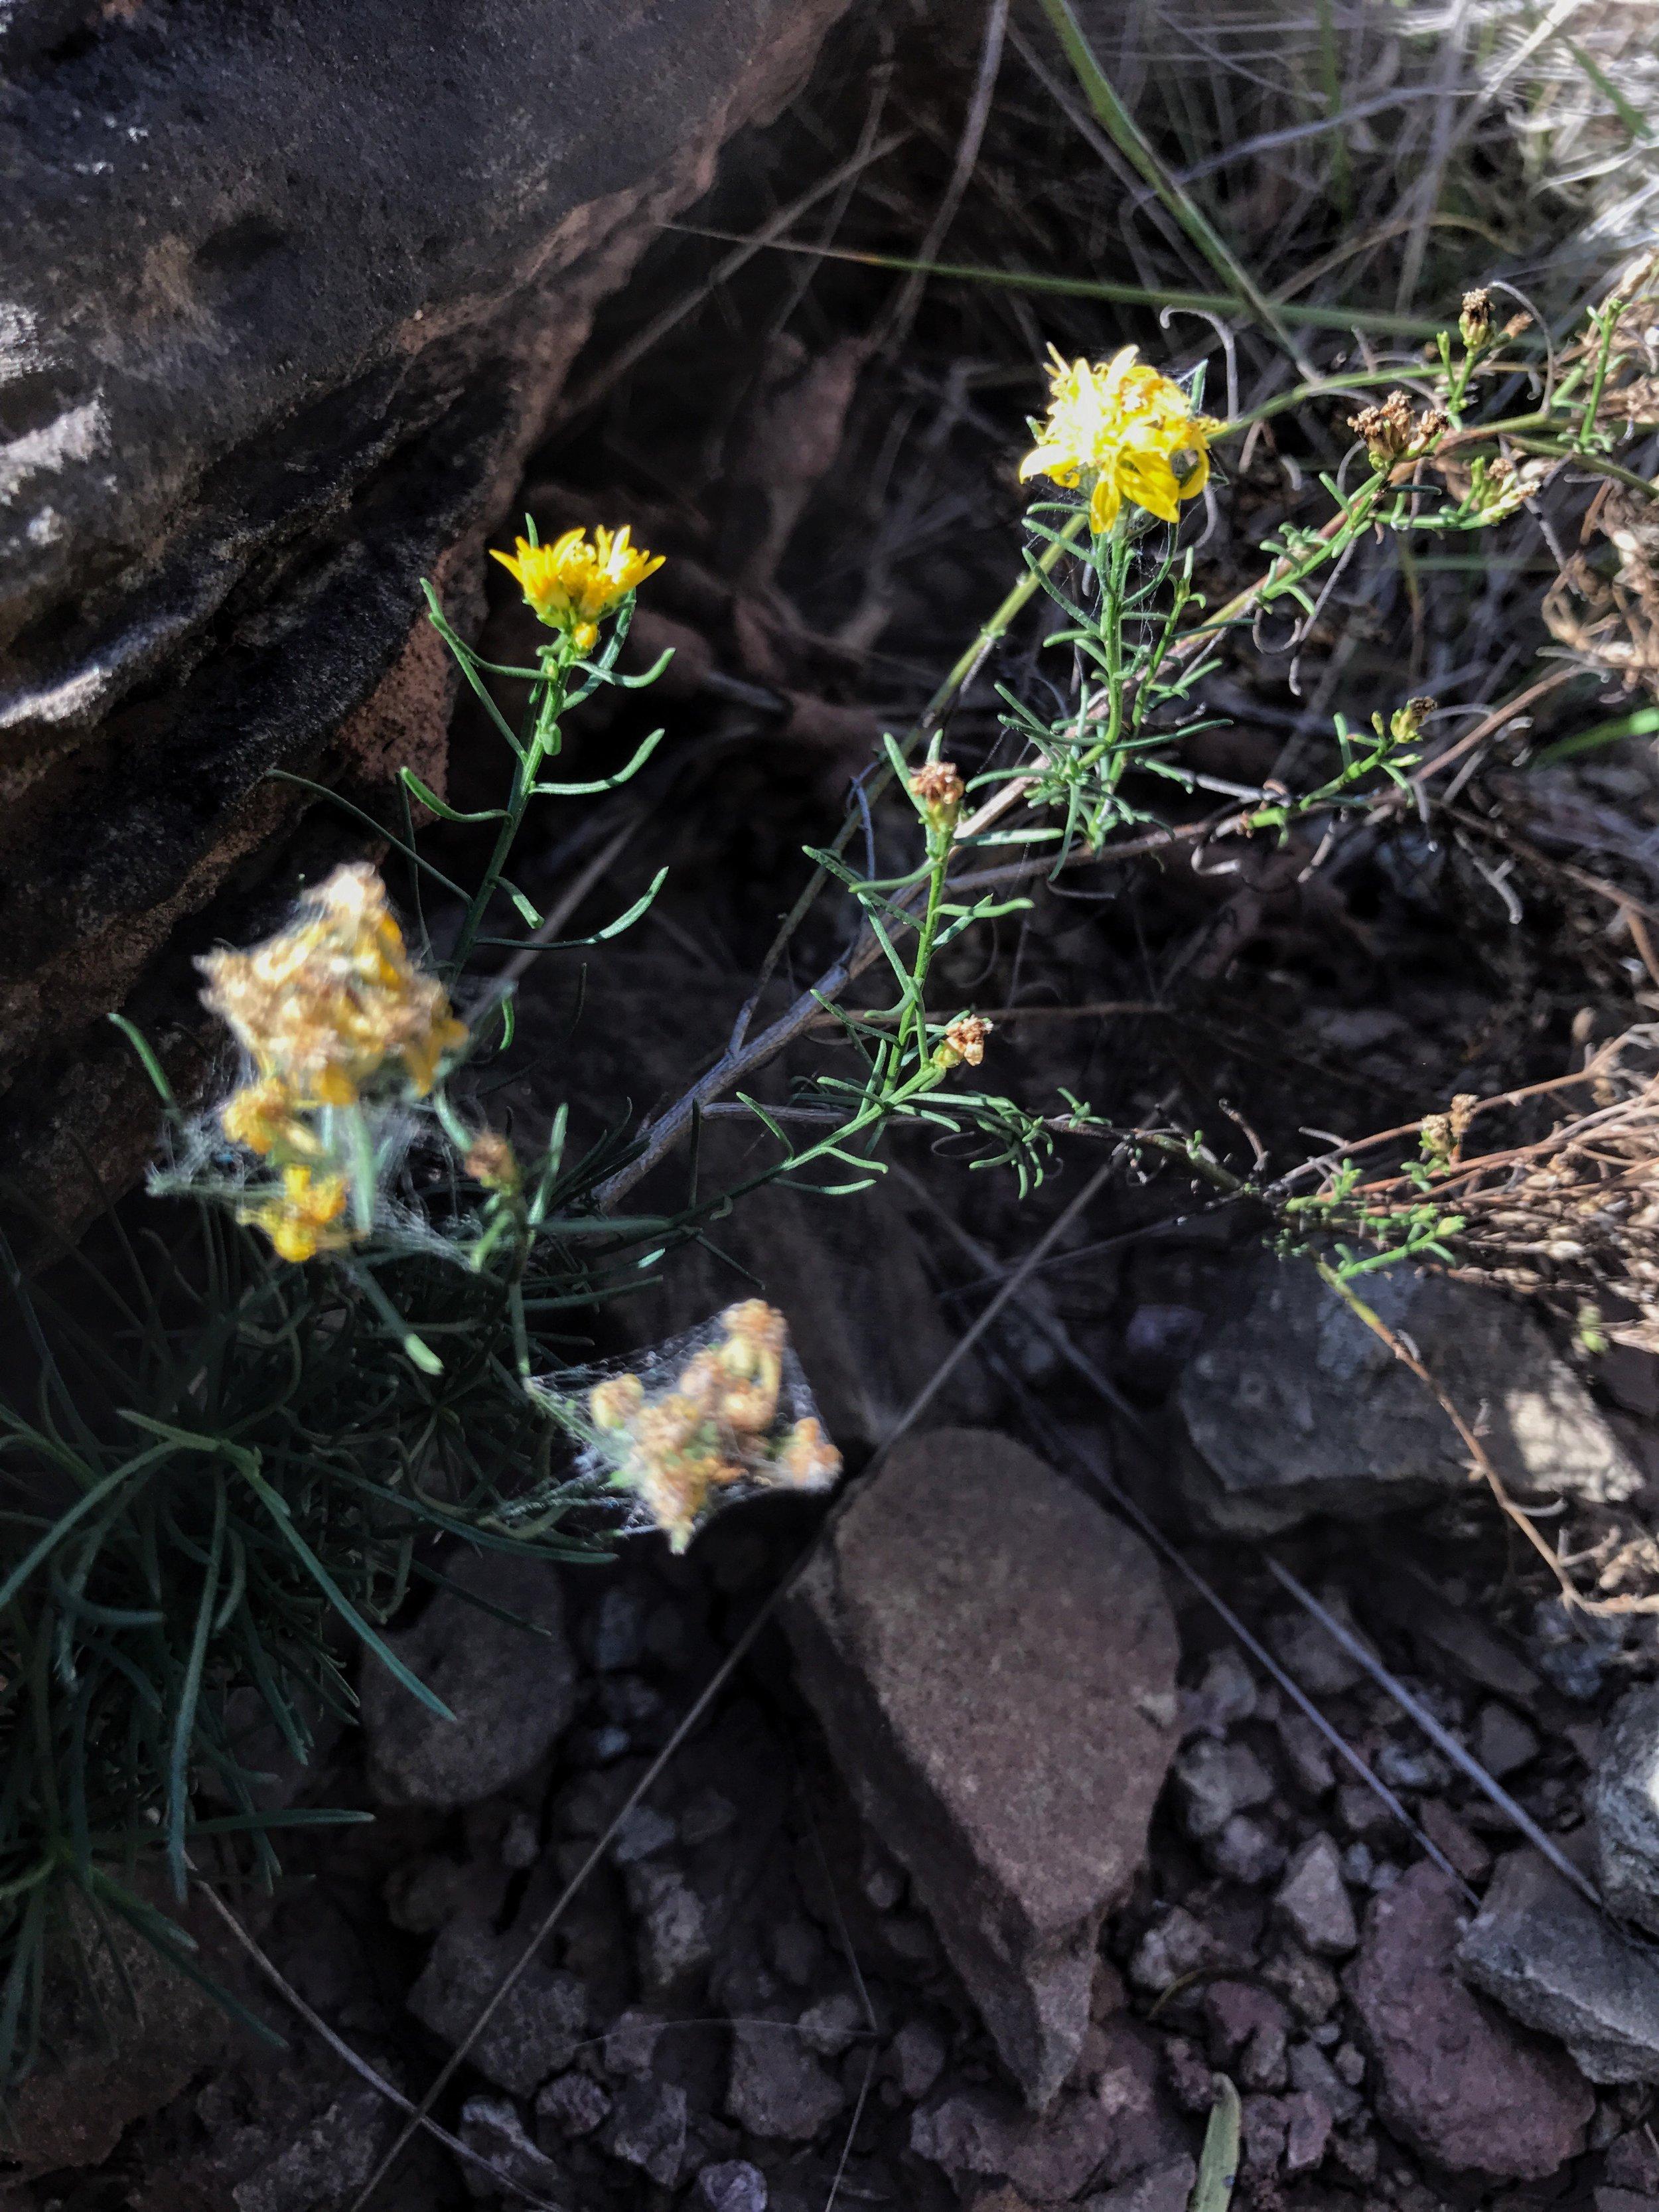 Gutierrezia sarothrae, Broom Snakeweed